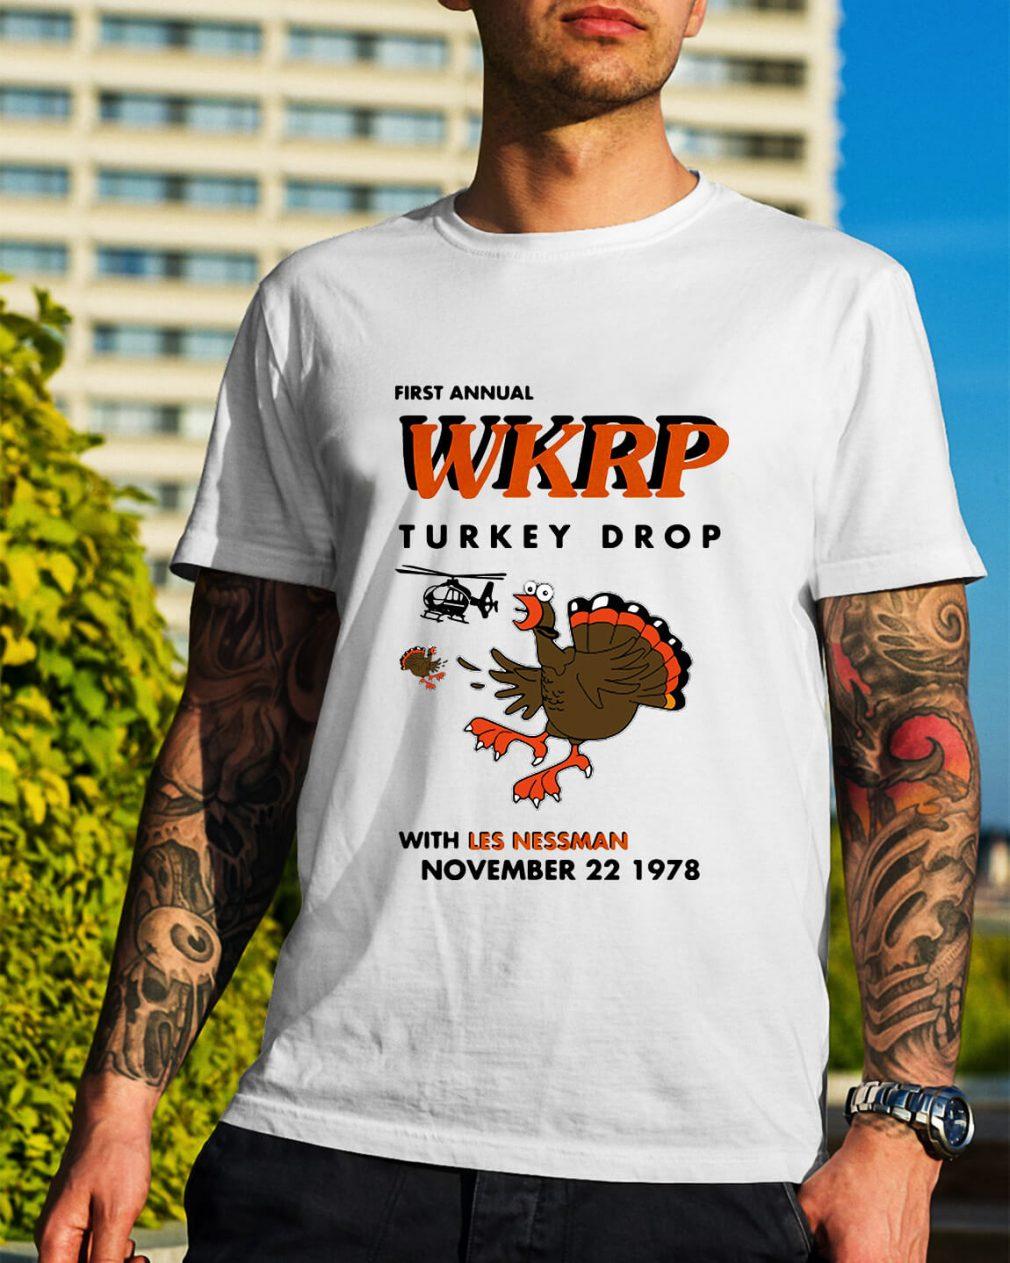 First annual WKRP turkey drop with Les Nessman November 22 1978 Guys Shirt